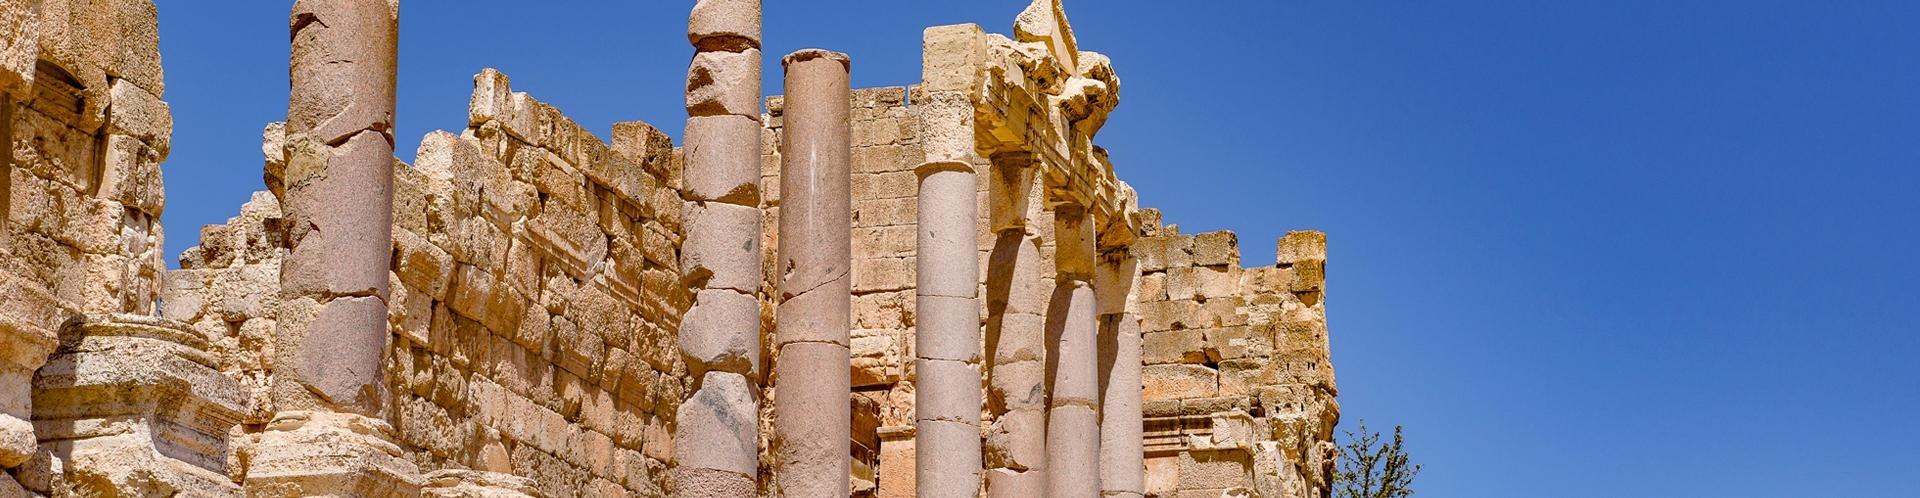 Baalbek, Libanon